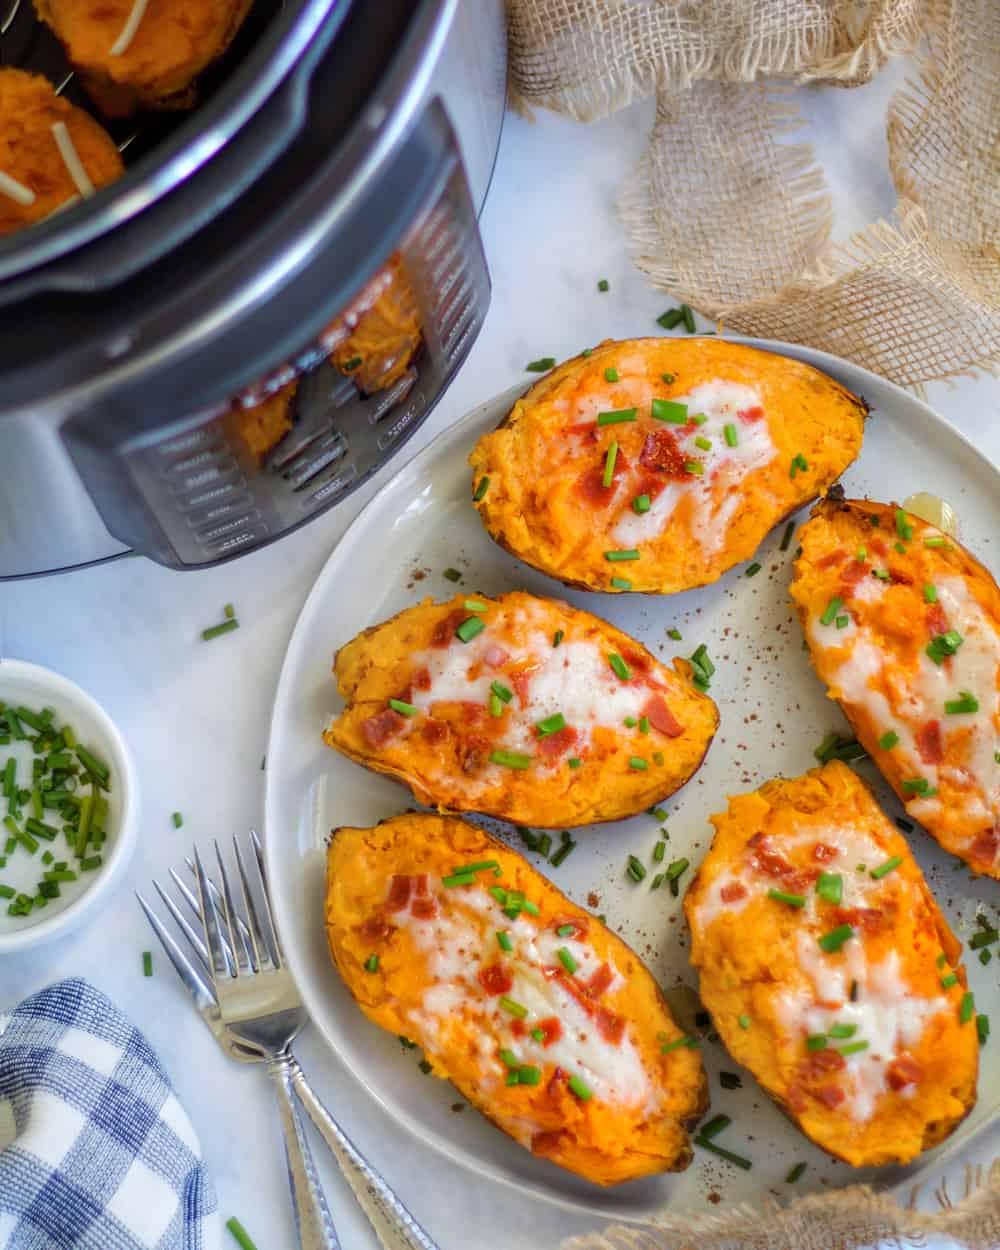 Vegan Sweet Potato Recipe - Pressure Cooker Twice Baked Sweet Potatoes